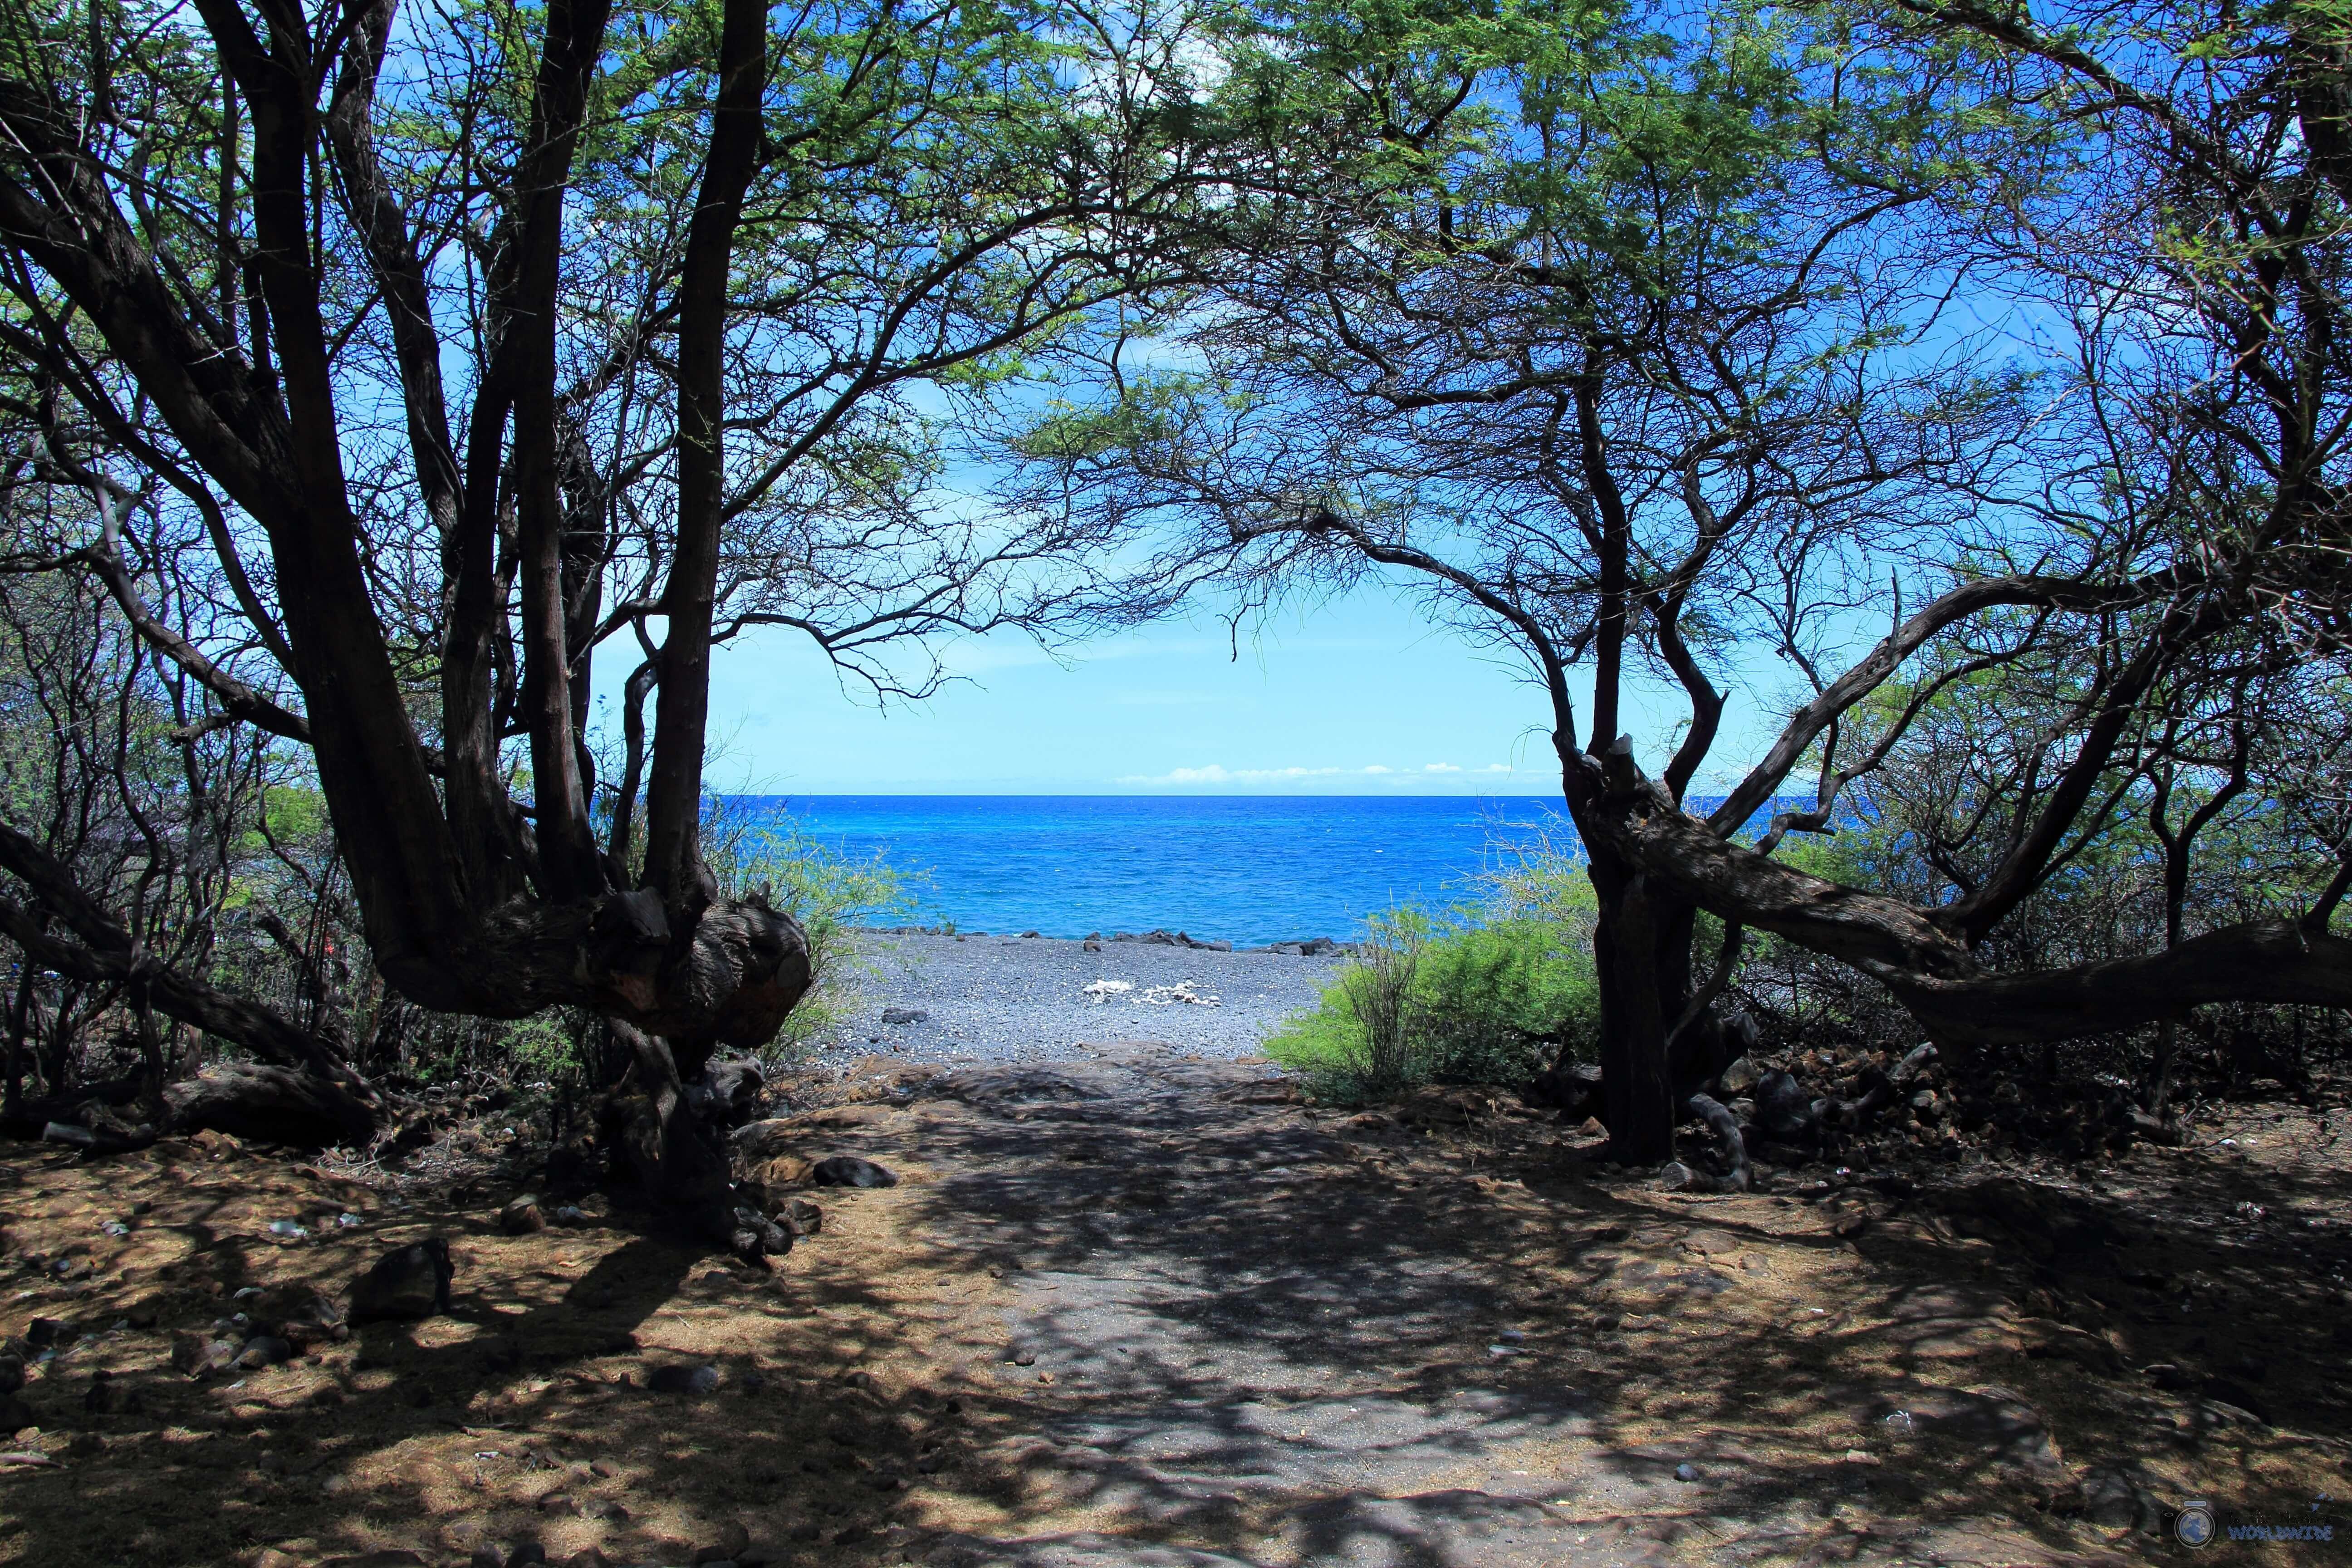 Entrance to Kiholo Bay, Kona, Island of Hawaii